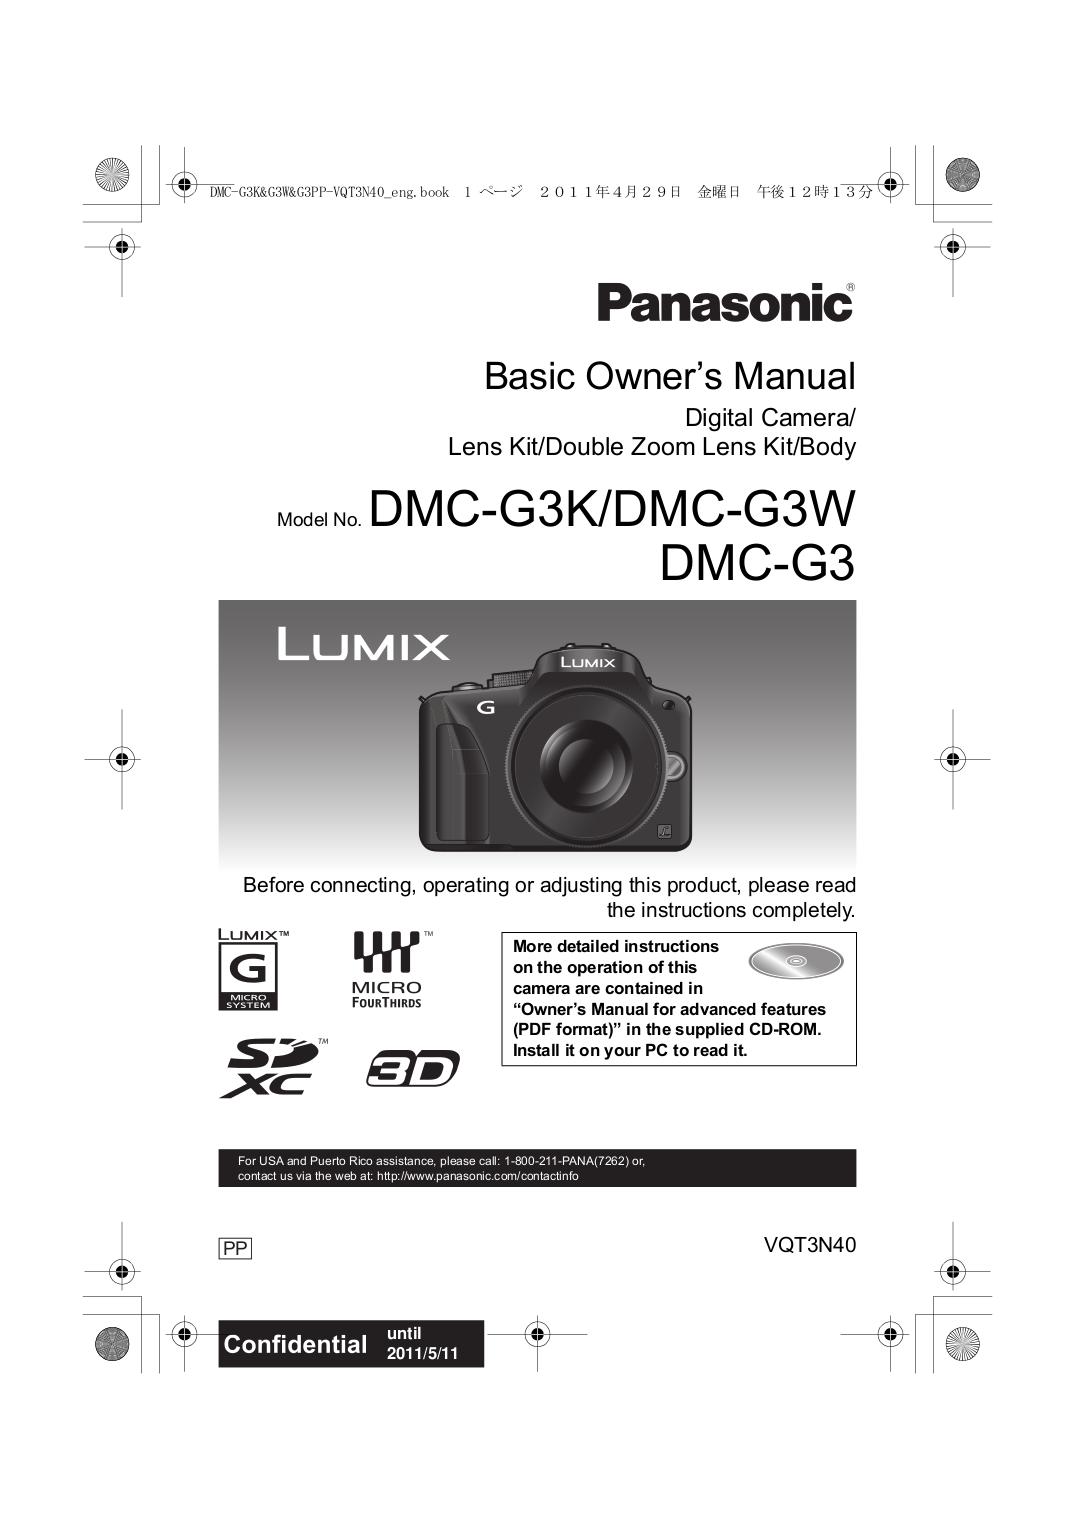 download free pdf for panasonic lumix dmc g3 digital camera manual rh umlib com panasonic lumix dmc g3 mode d'emploi panasonic lumix dmc g3 user guide